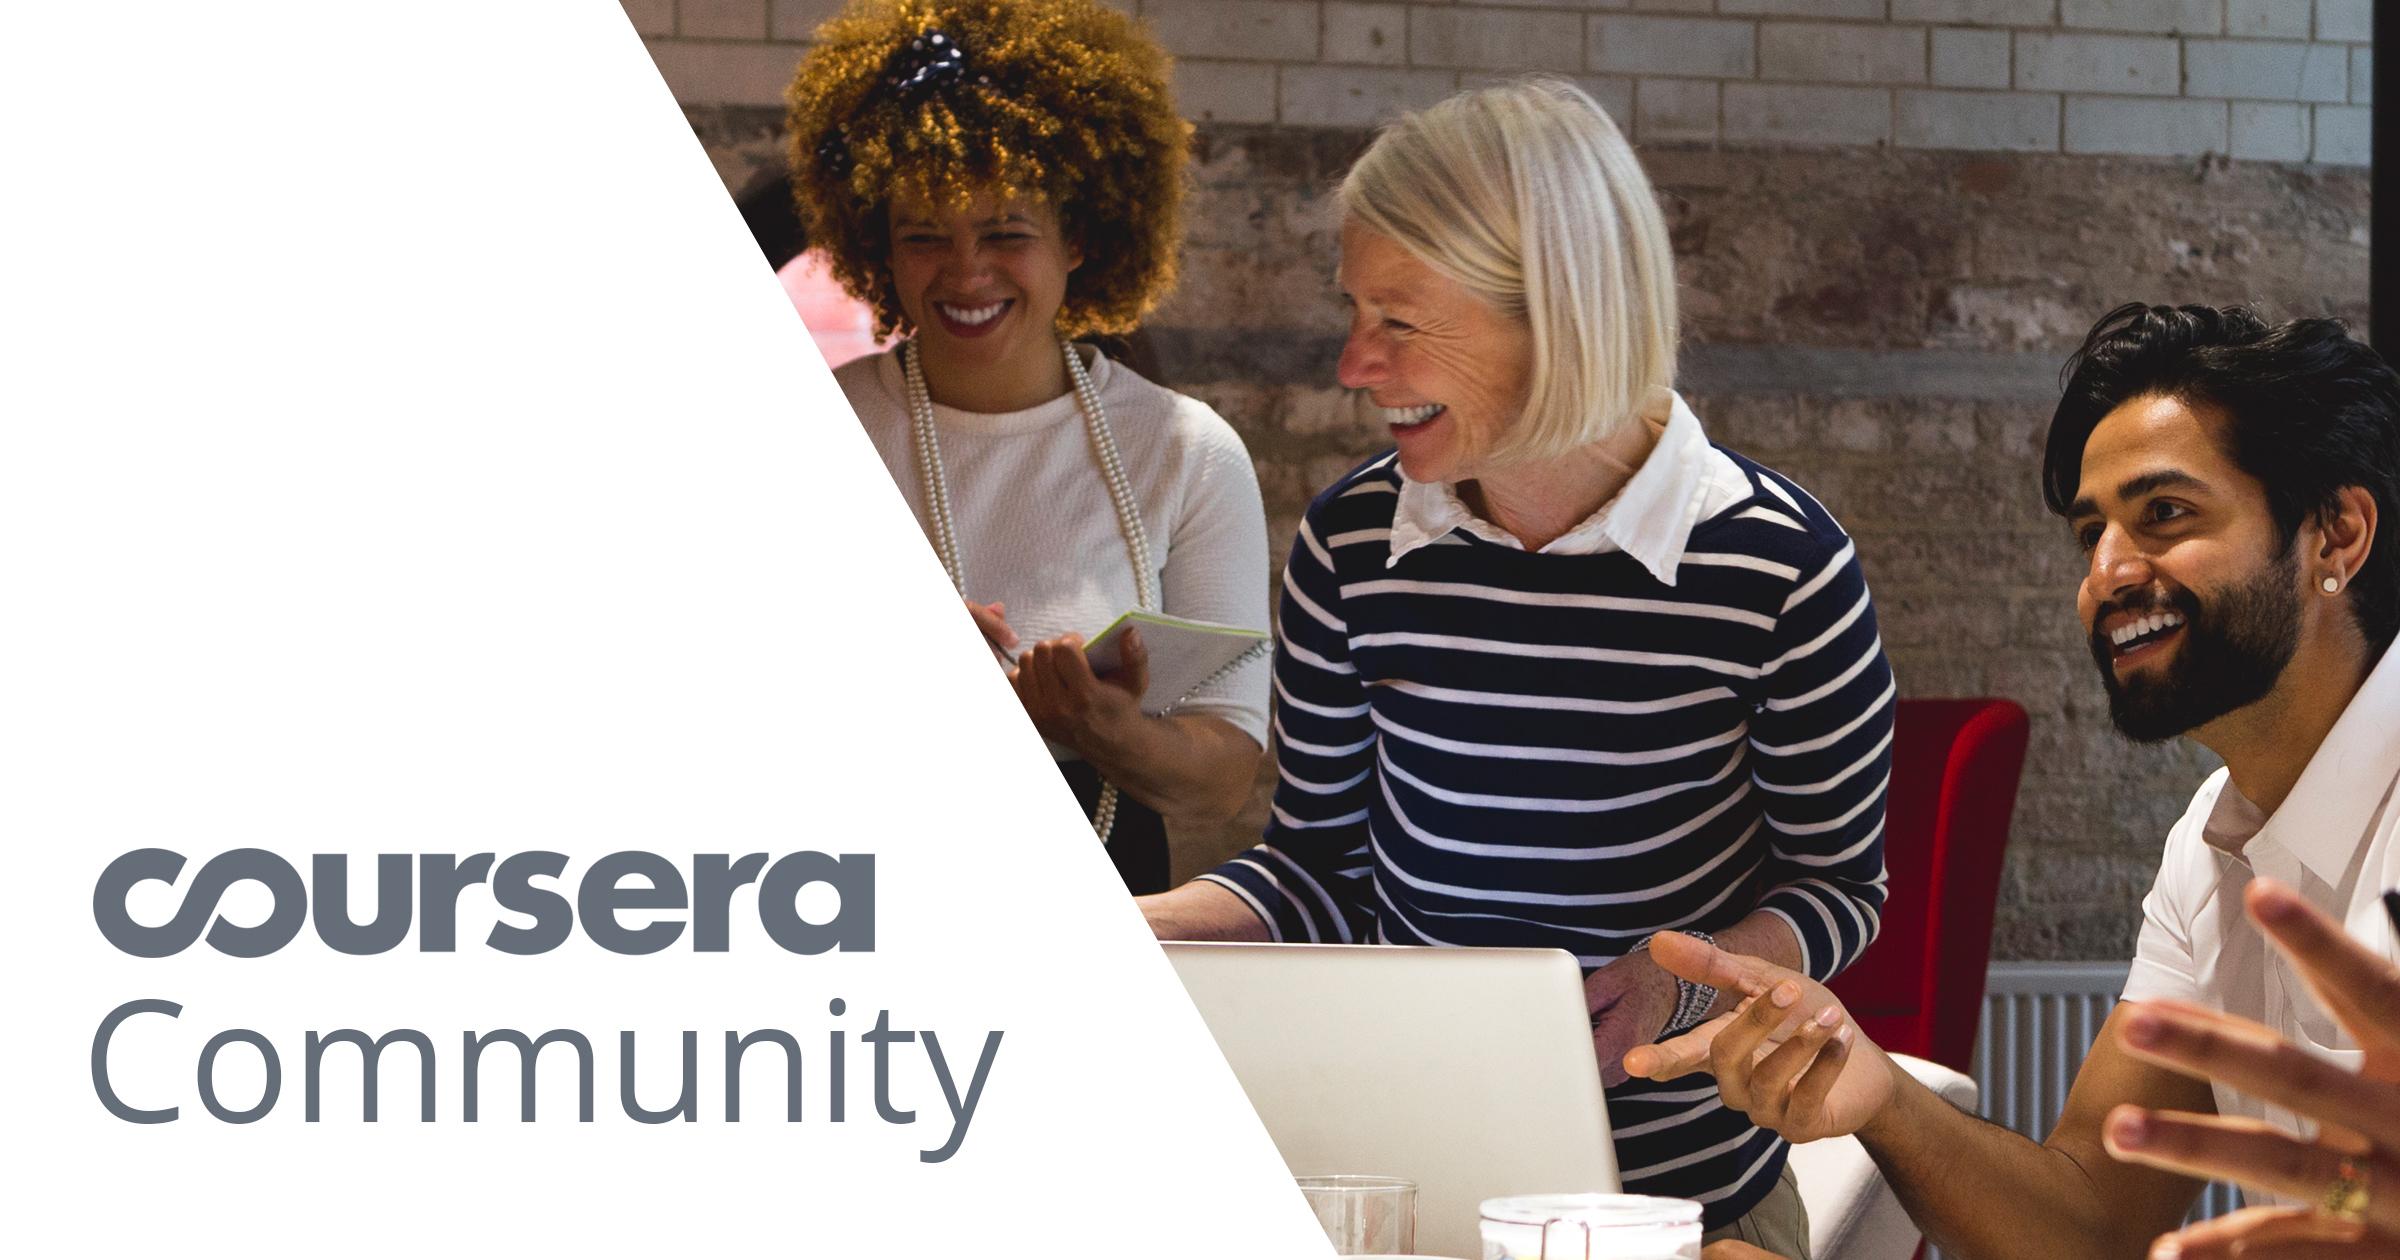 coursera.community